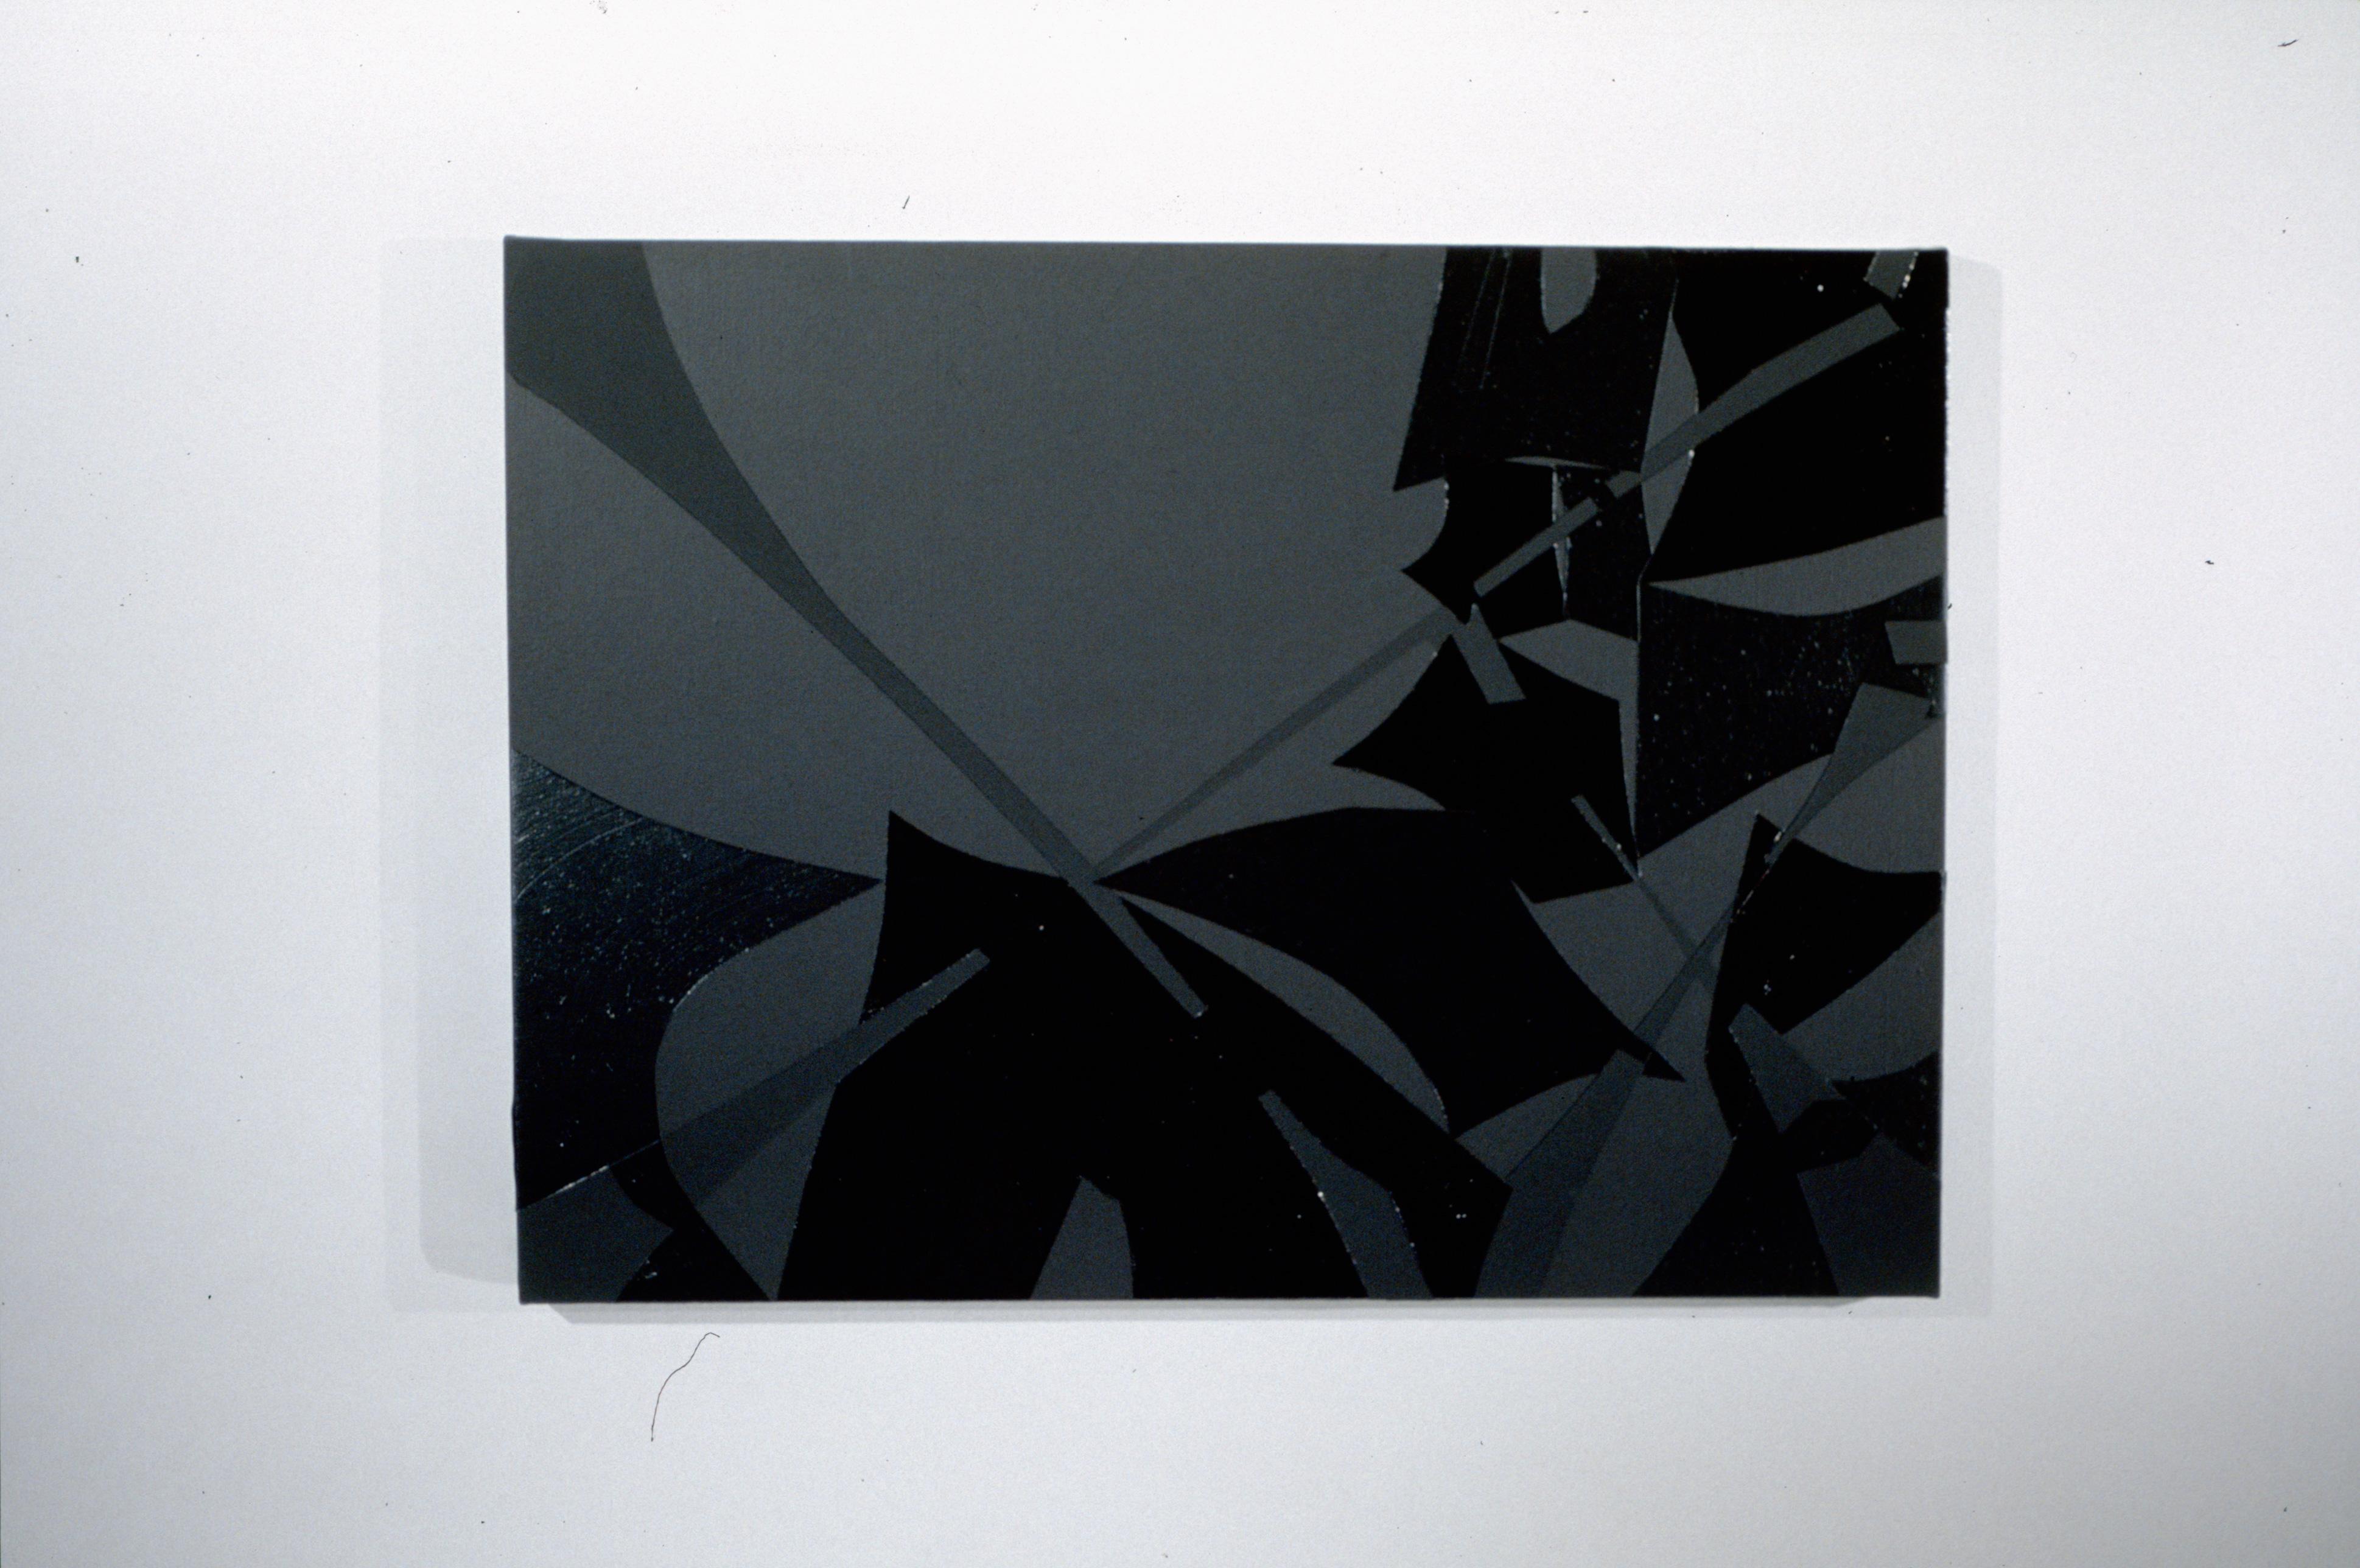 Black Study #06 | 22x31in | 2002